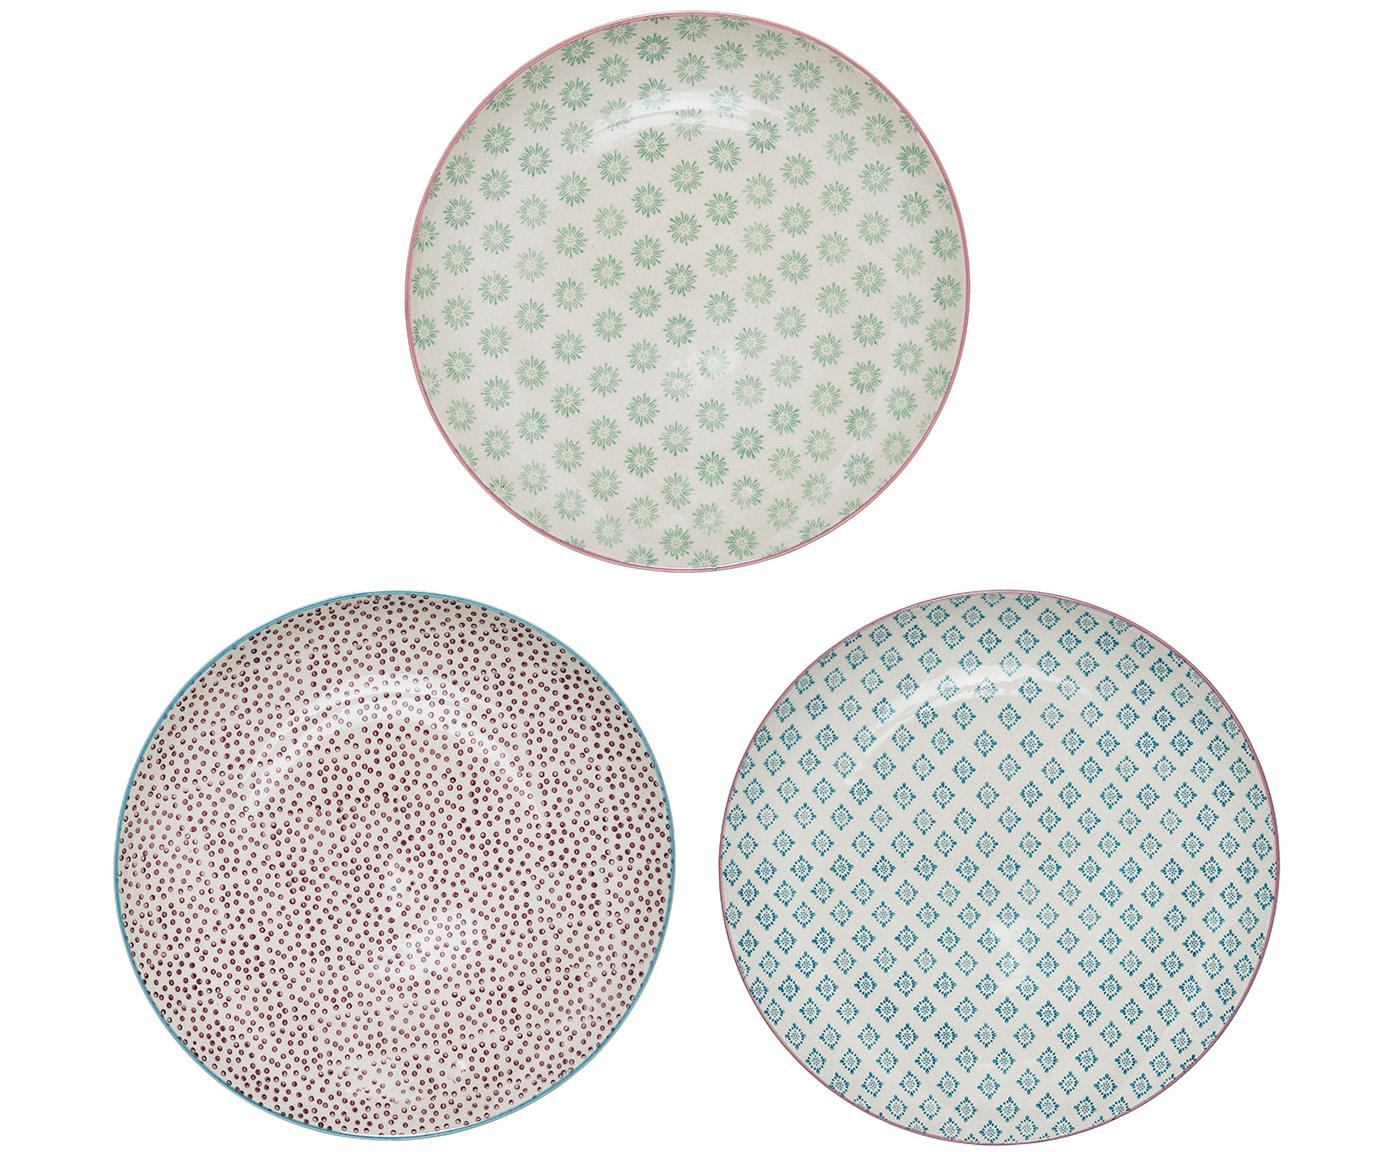 Dinerbordenset Patrizia, 3-delig, Keramiek, Wit, groen, rood, blauw, Ø 25 cm